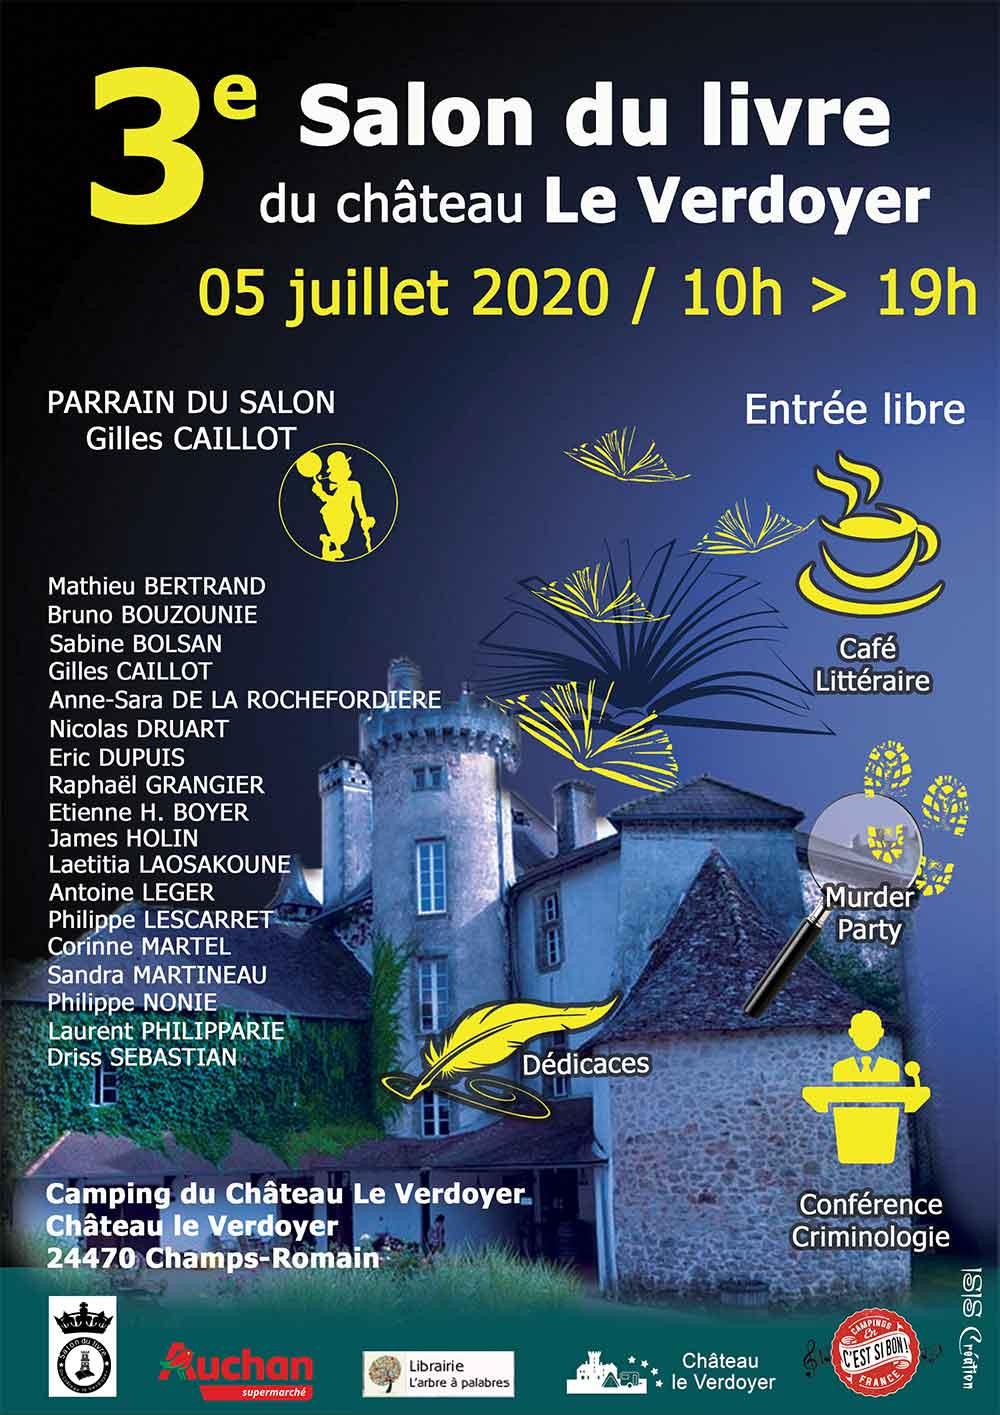 Dordogne camping book fair